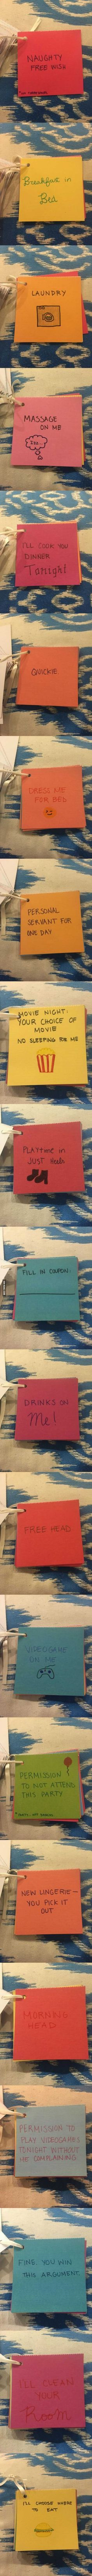 This Guy's Girlfriend Made Him Coupons For Their Anniversary More #boyfriendgiftsideas